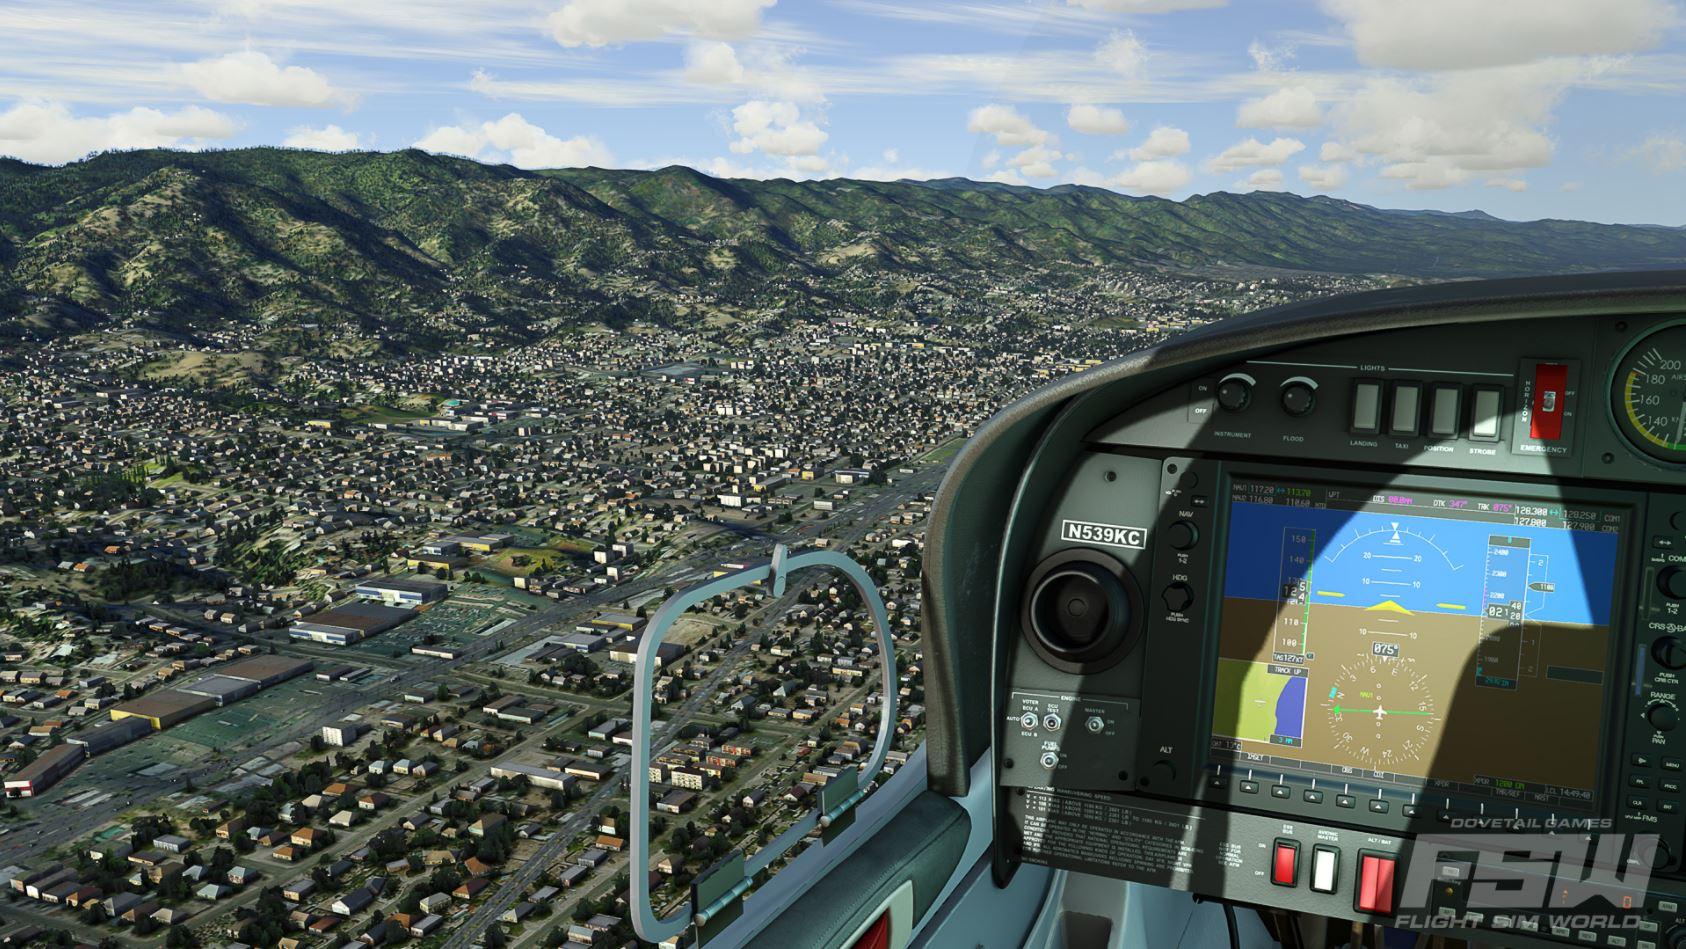 flight-sim-world-en-acces-anticipe-sur-steam-screen18